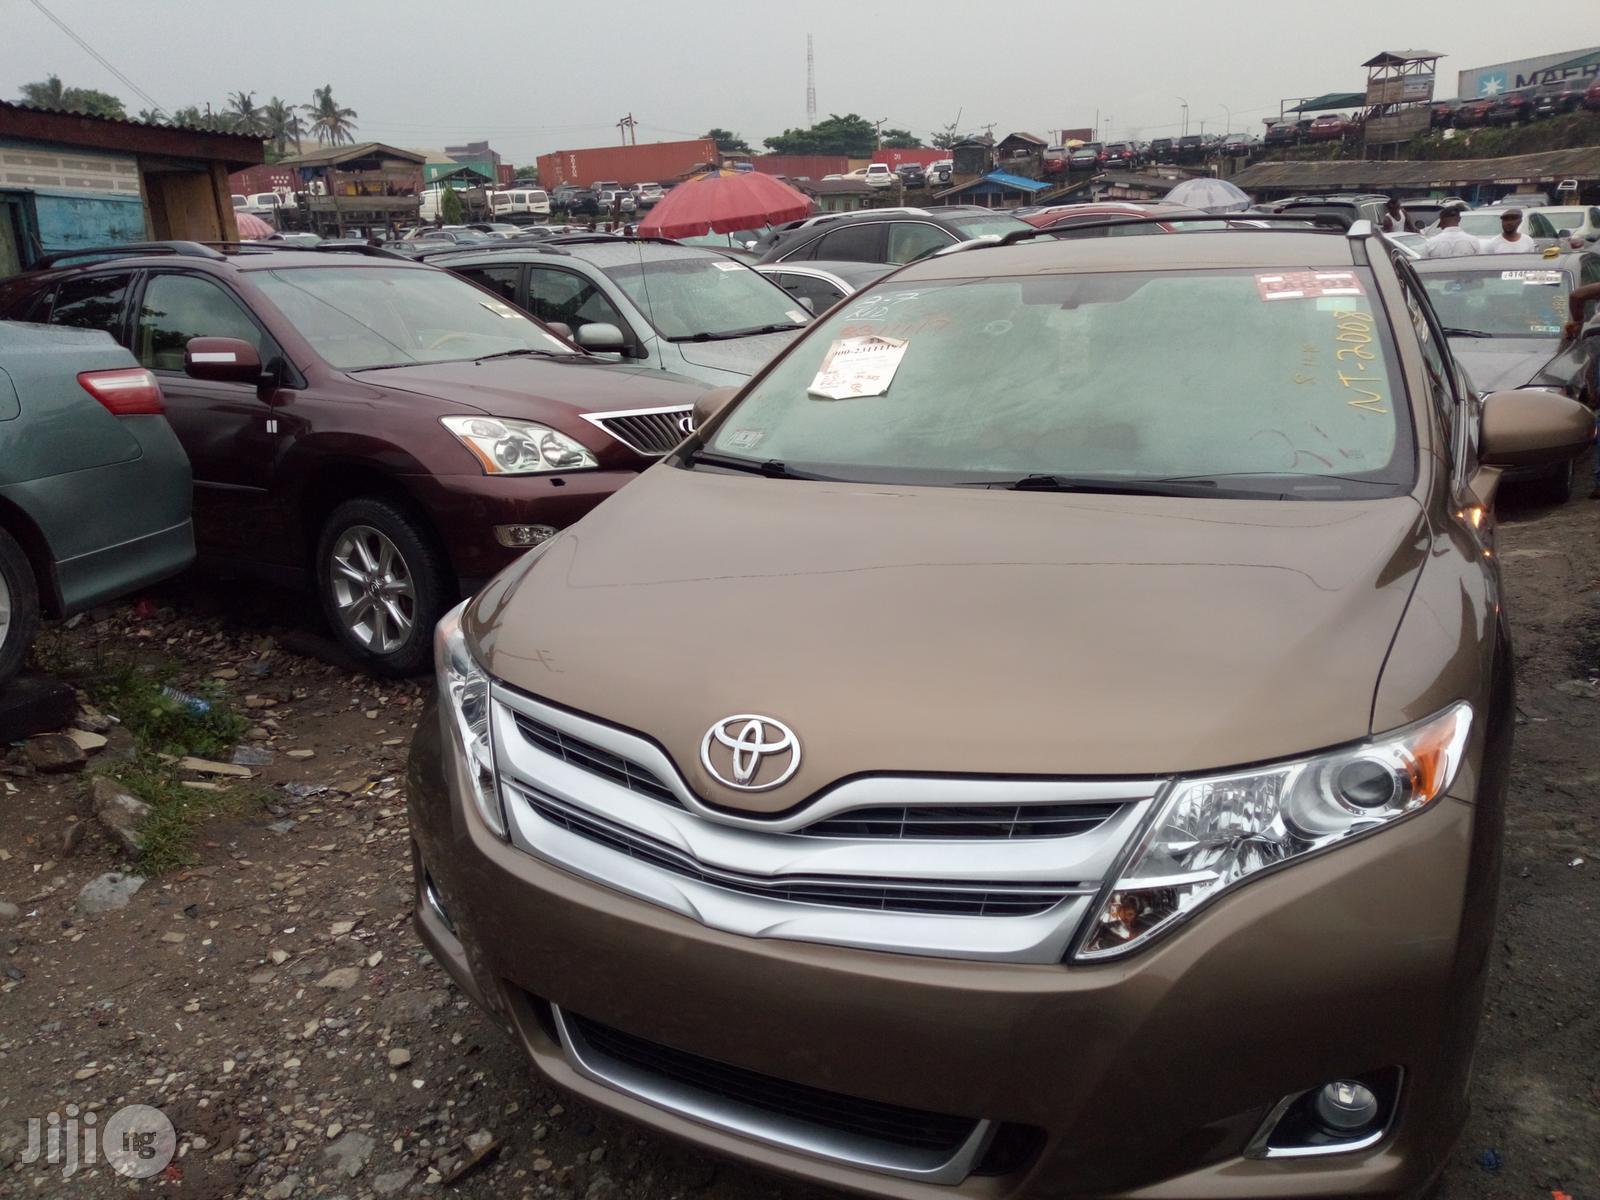 Toyota Venza 2009 Brown